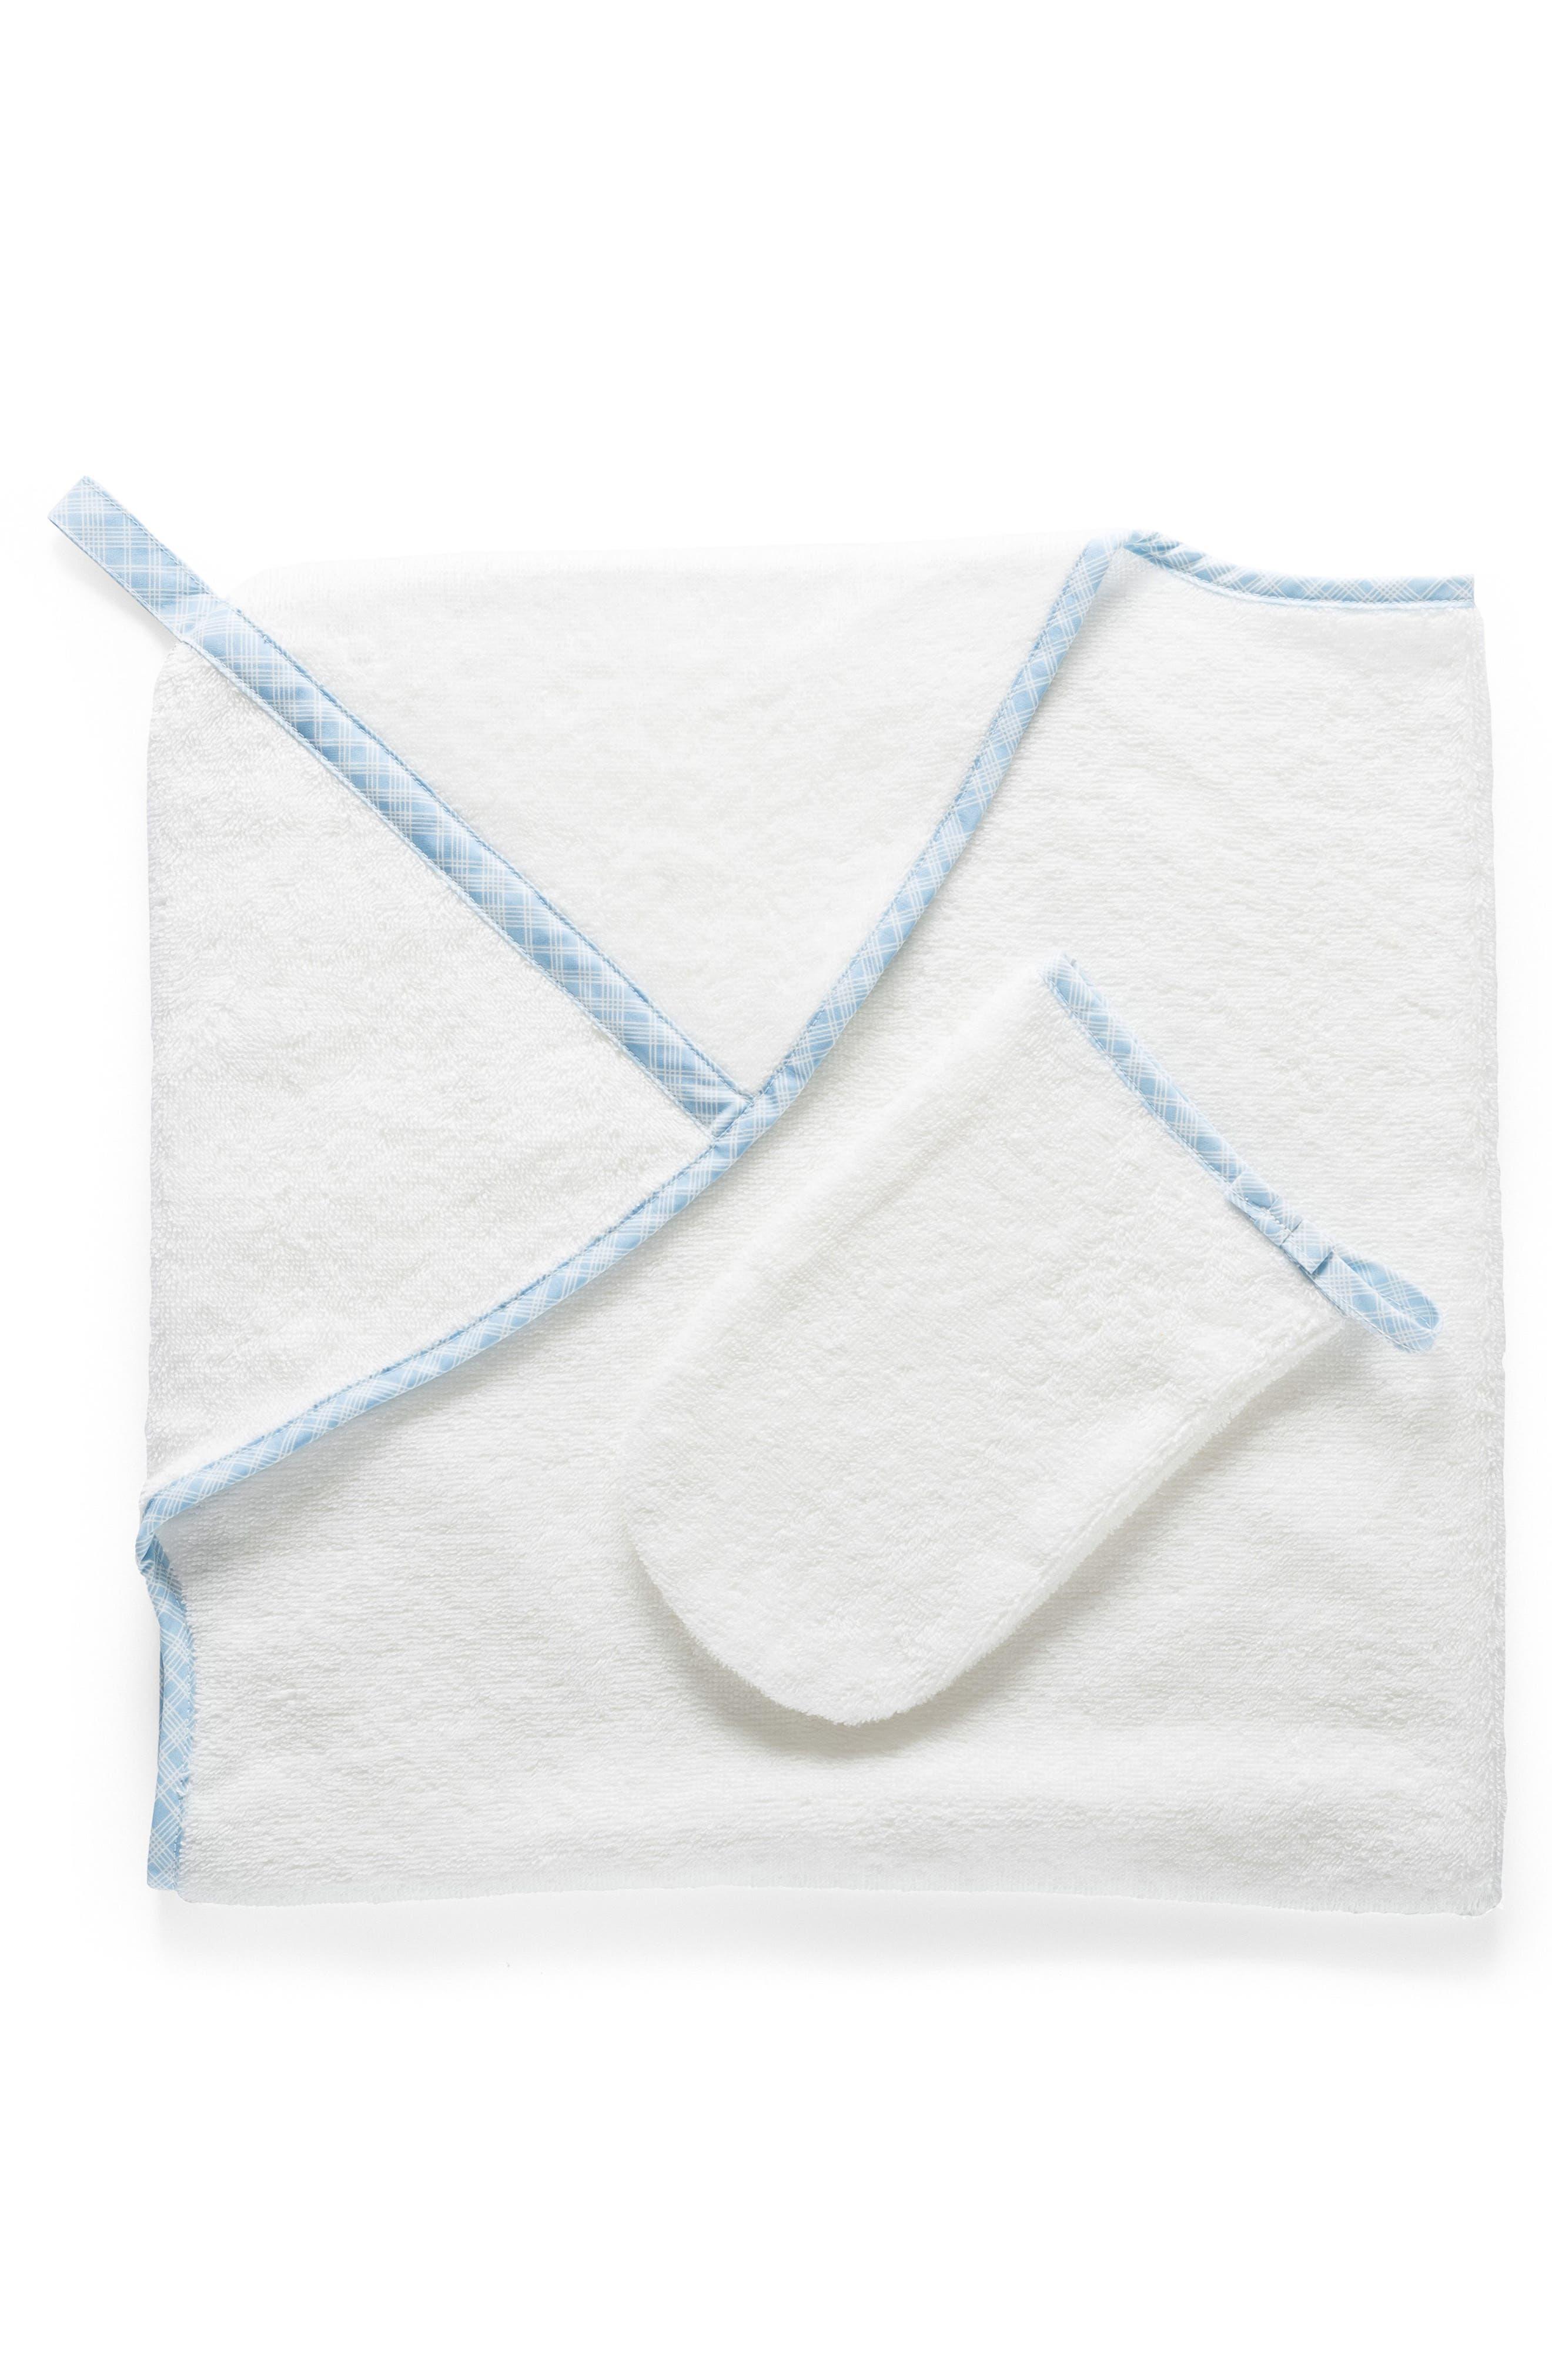 Hooded Towel & Bath Mitt Set,                         Main,                         color,